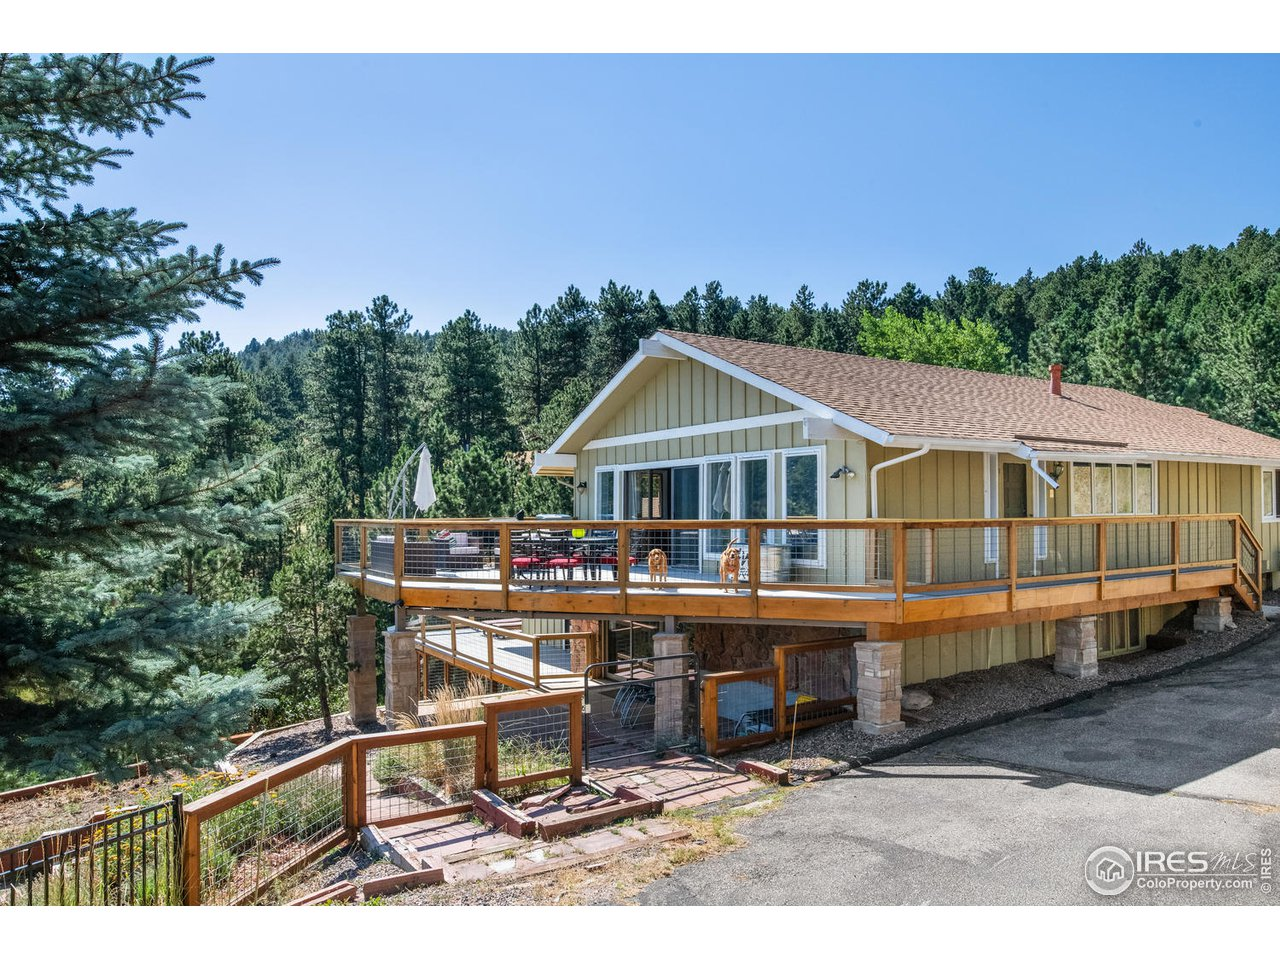 1670 Timber Ln, Boulder CO 80304